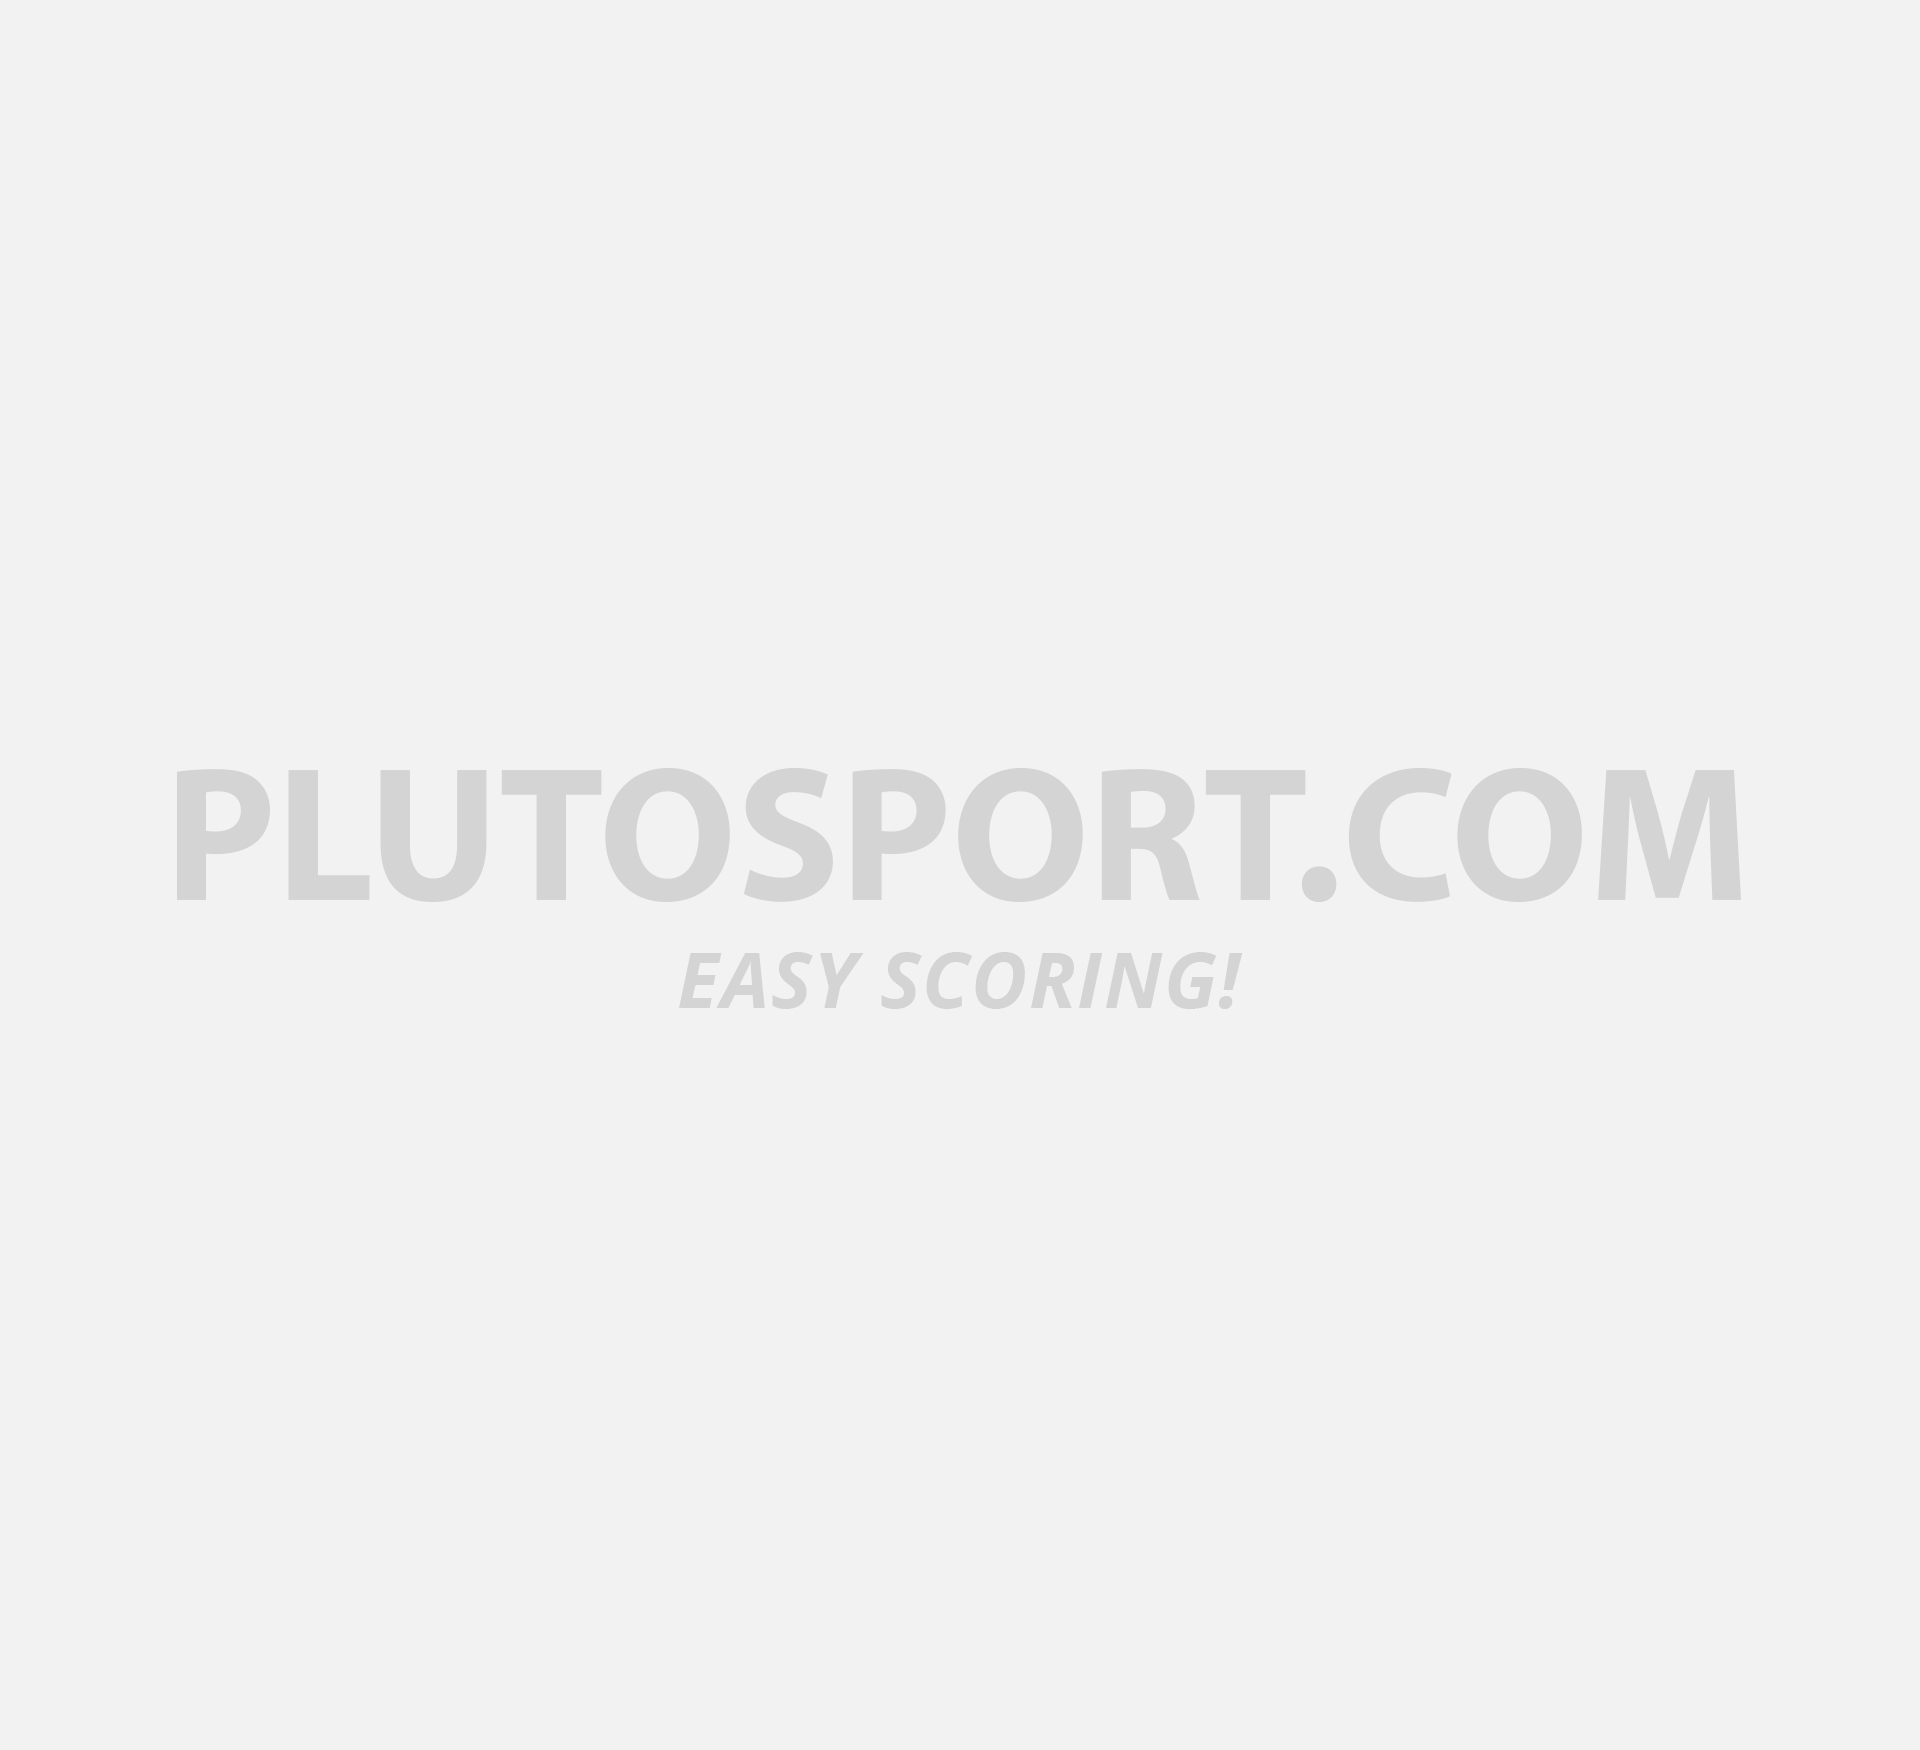 facd6234781 Jack & Jones T3ch Trinton Swim short - Swimshorts - Shorts - Clothing -  Lifestyle - Men | Plutosport